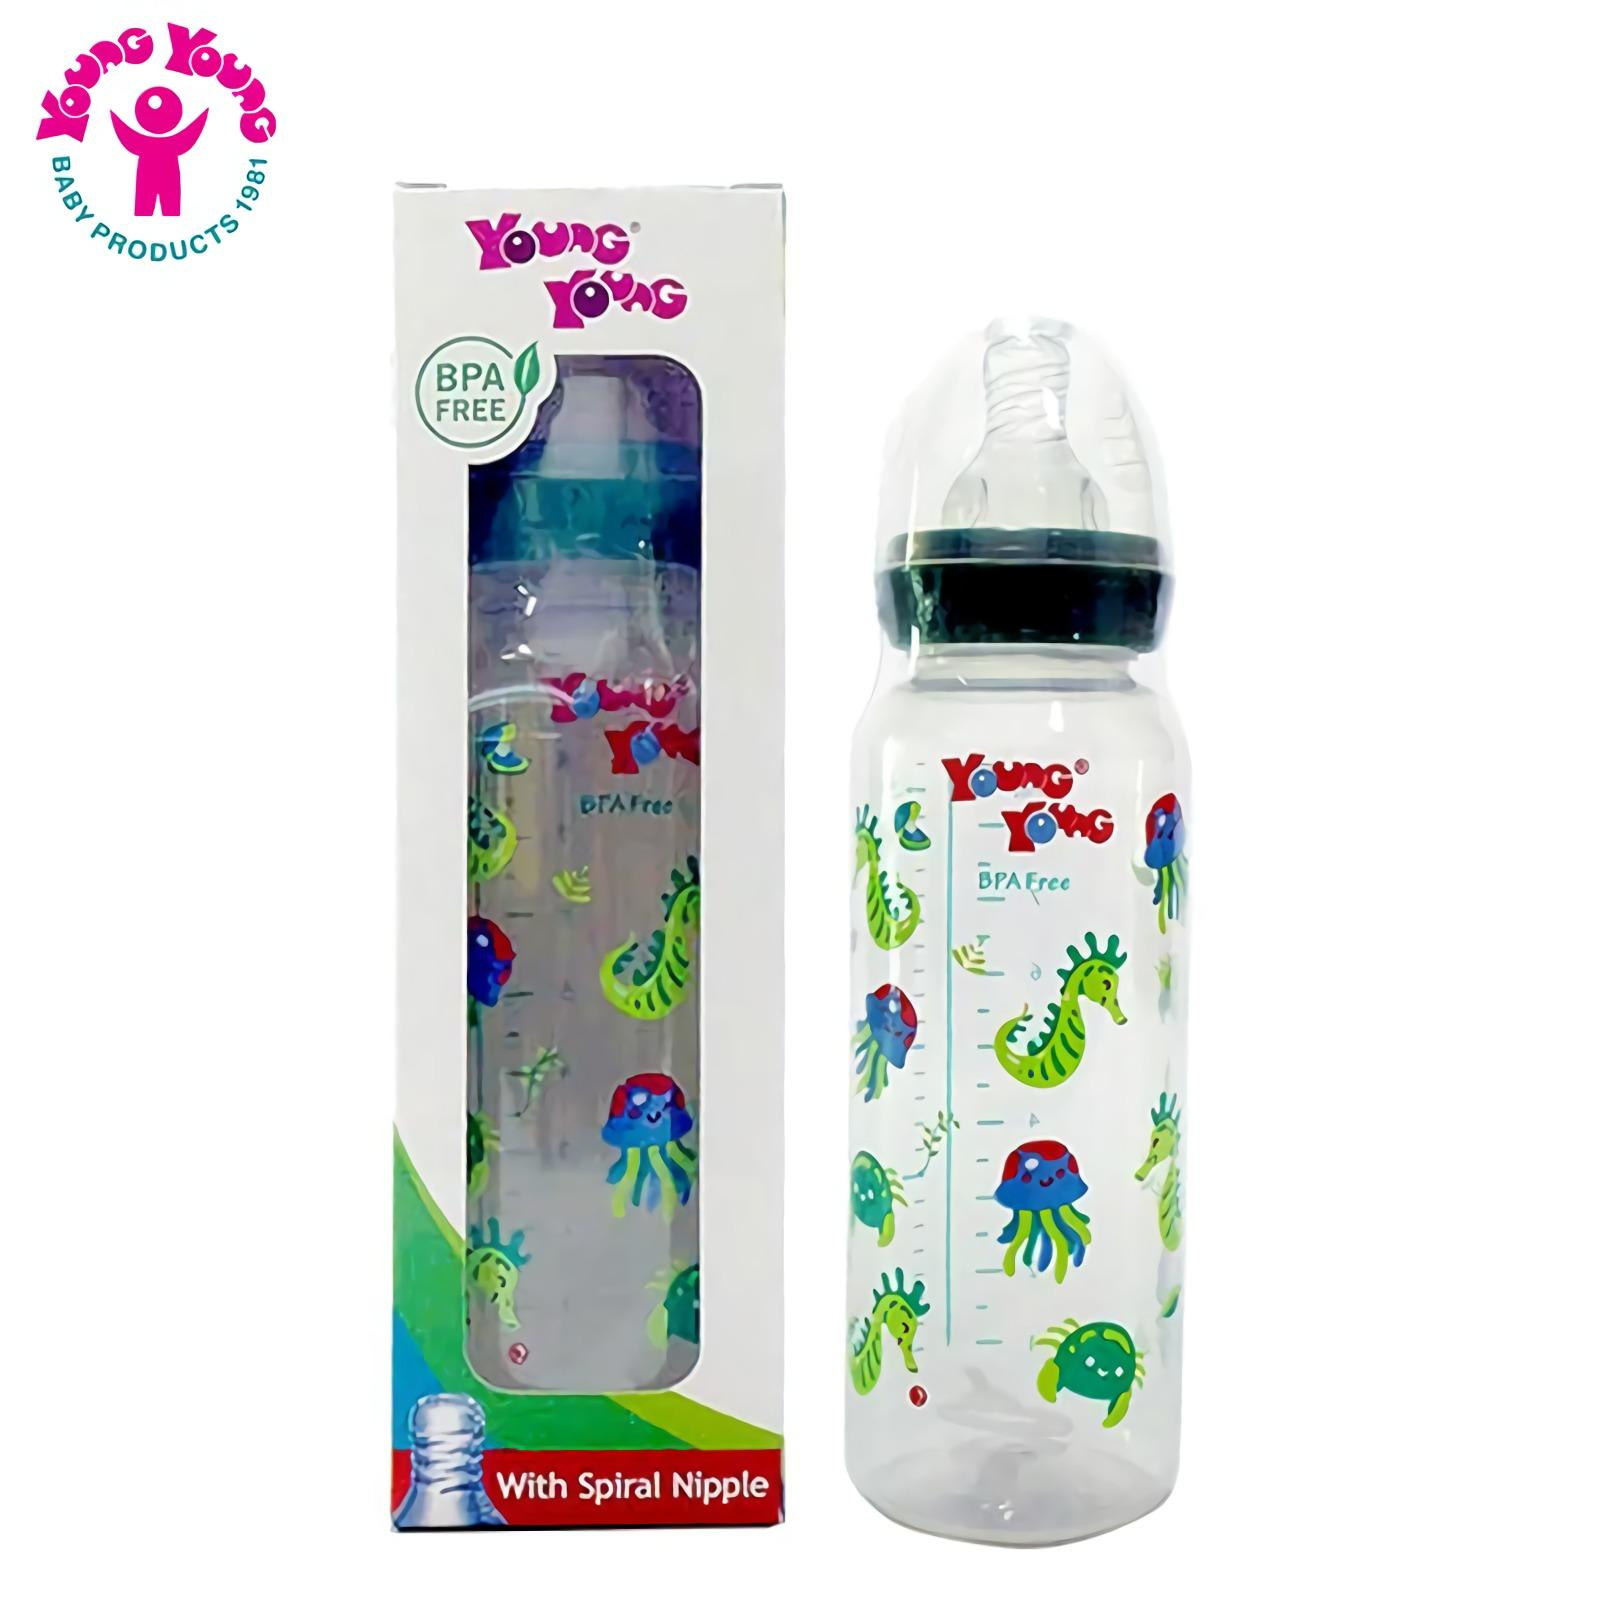 YOUNG YOUNG Botol Susu IL-811 Baby Bottle BPA Free 250 ML Ungu | Lazada Indonesia